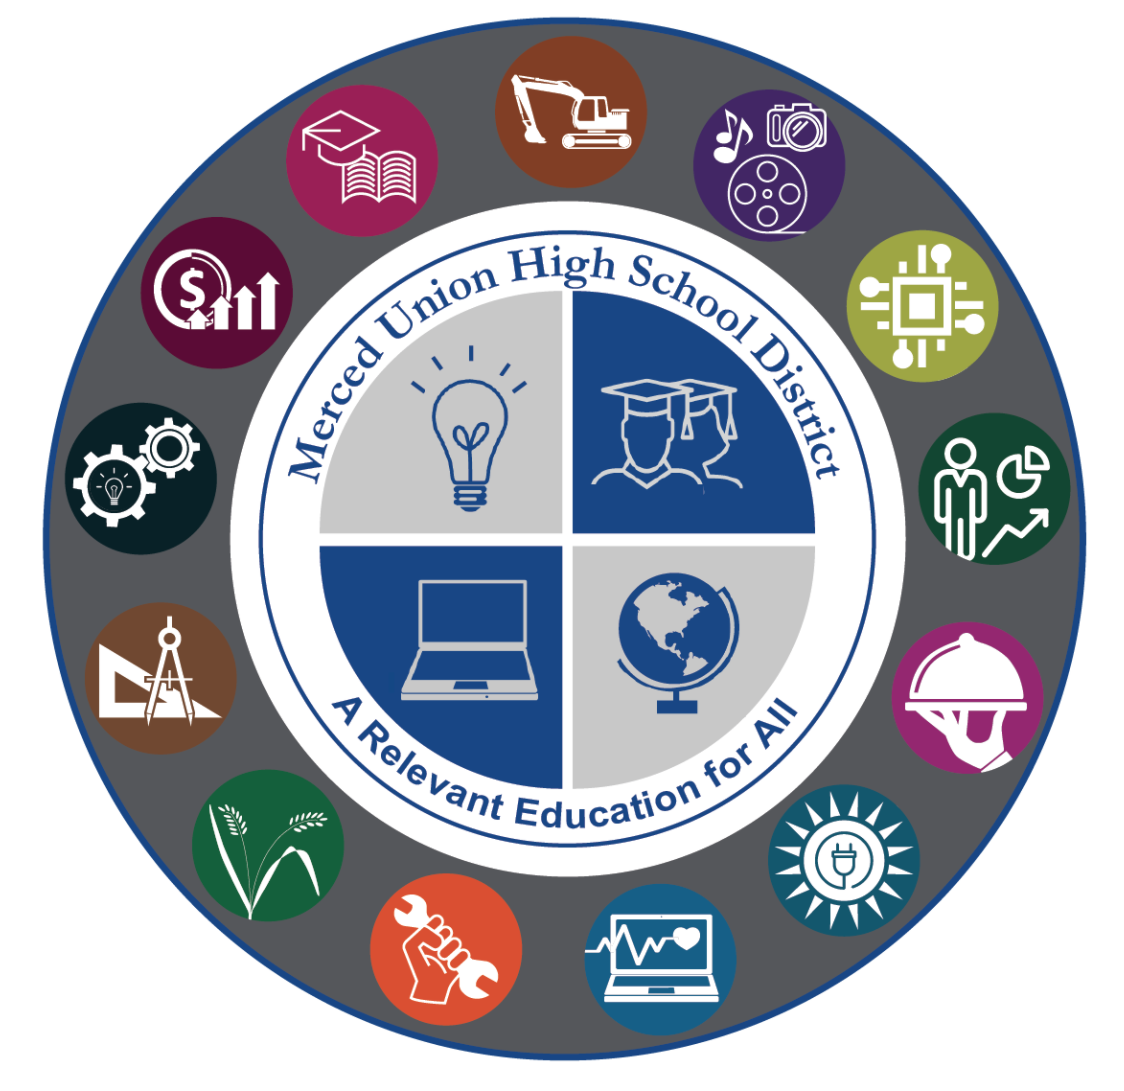 Career Technical Education - Merced Union High School District